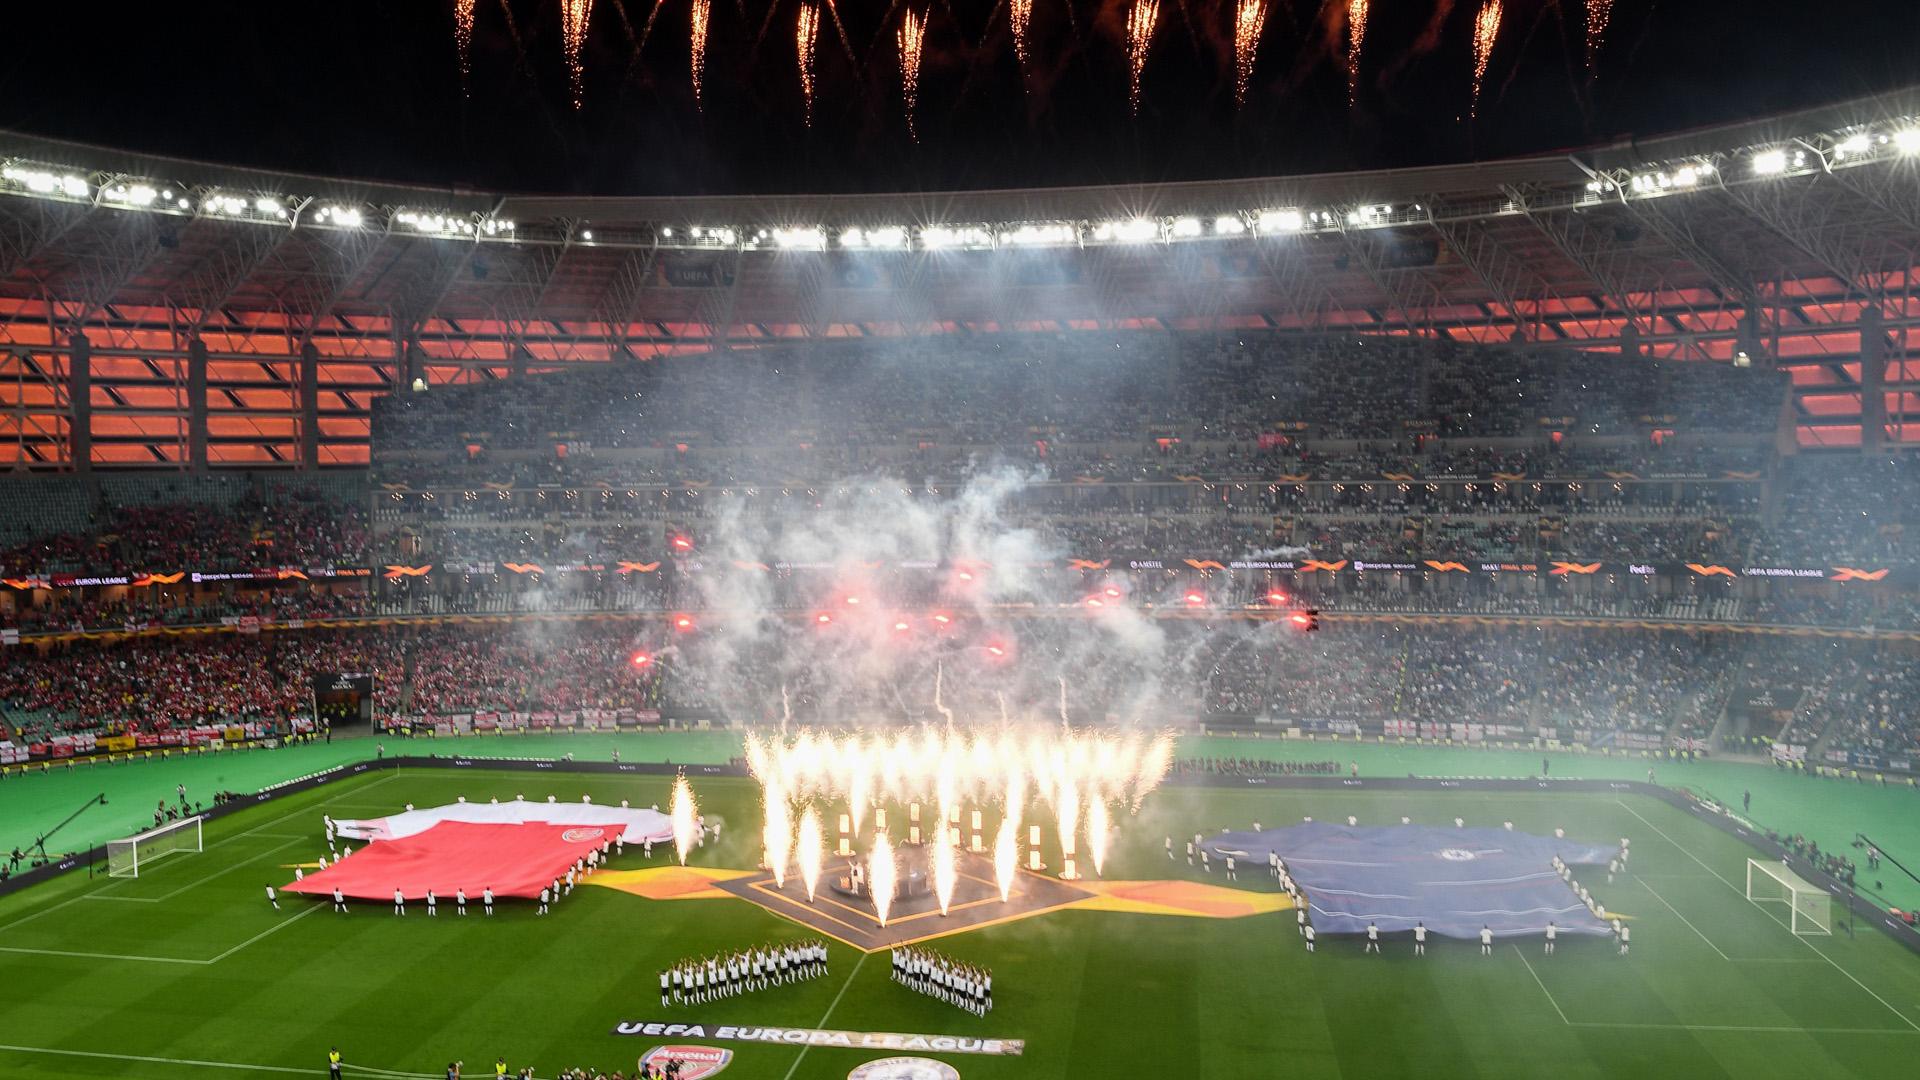 Europa League Finale Live